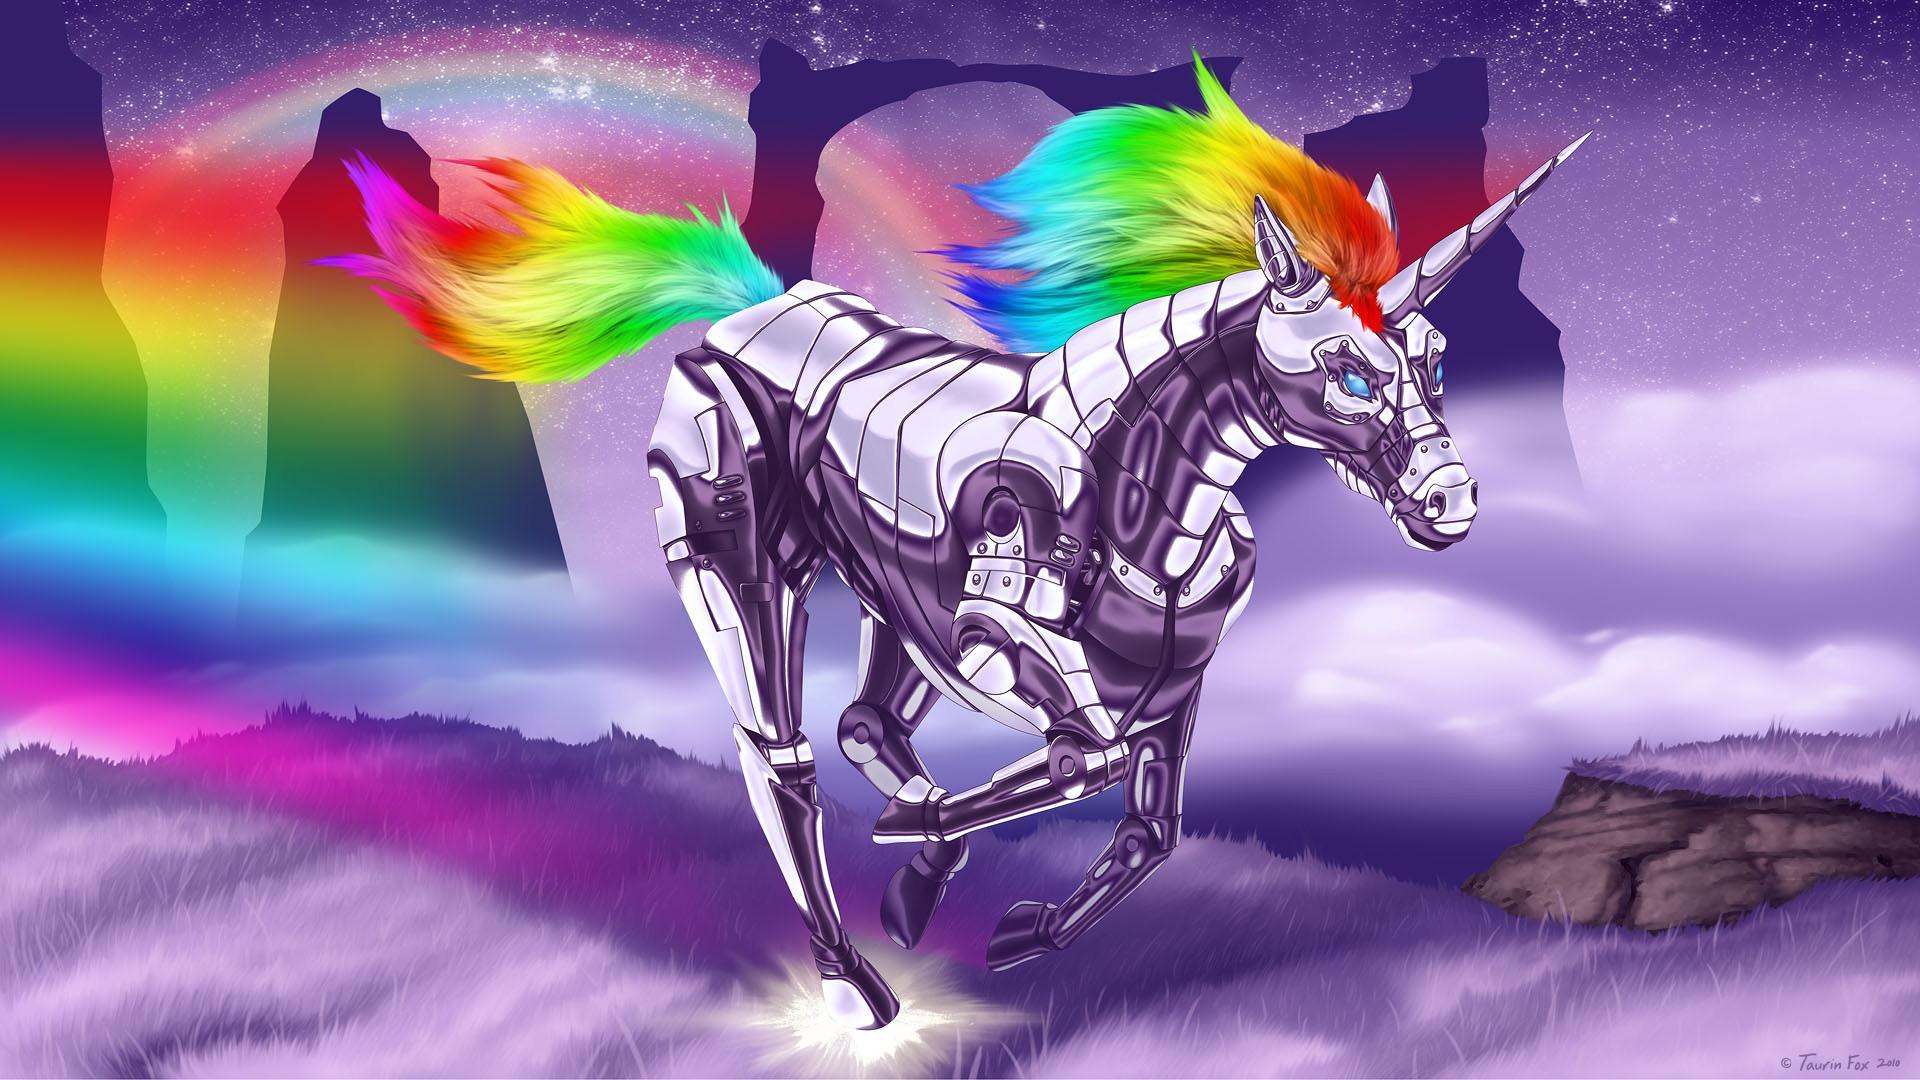 hinh nen ky lan unicorn 22